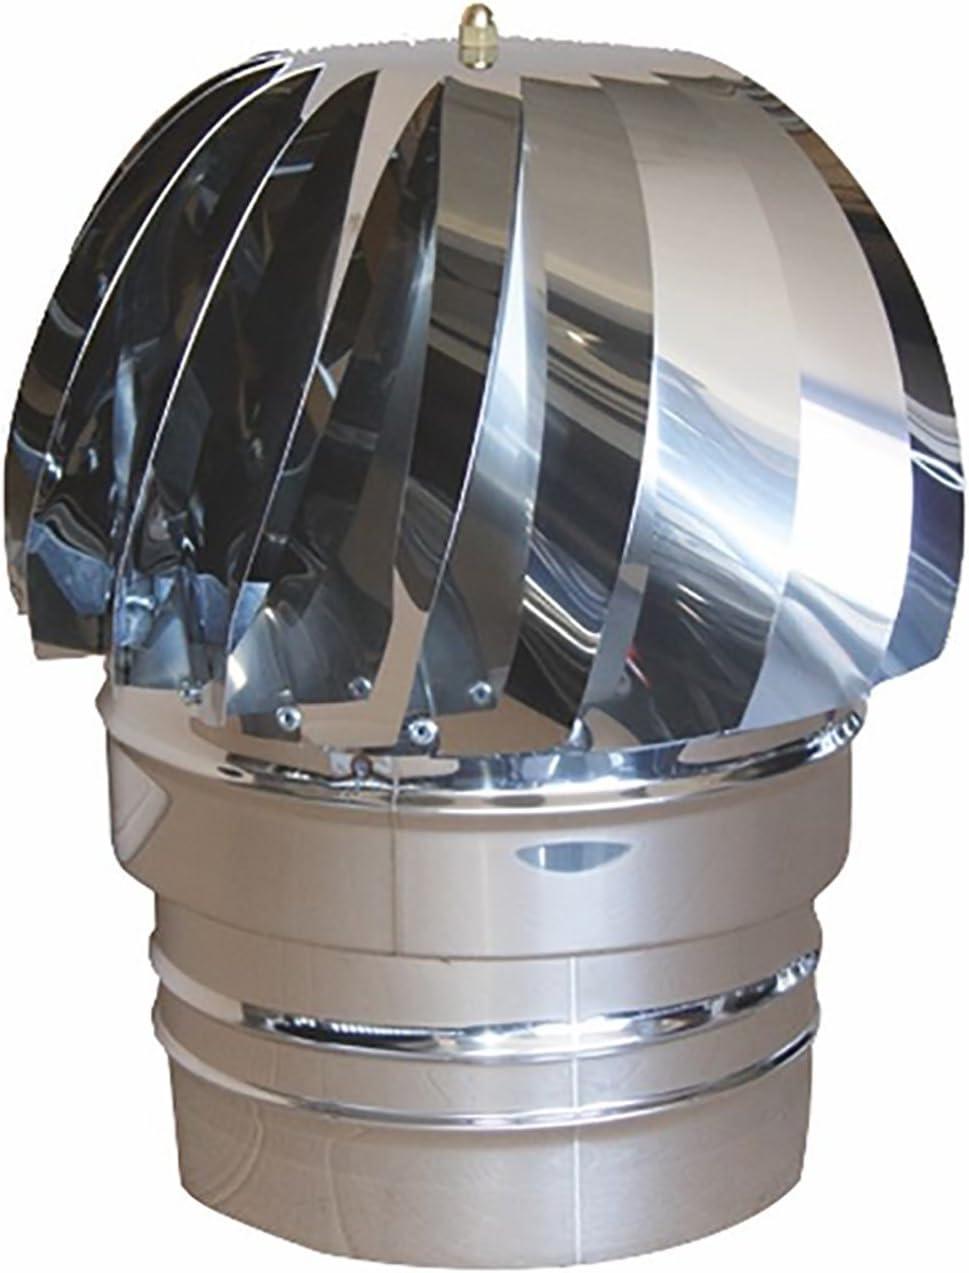 Mistermoby SOMBRERETE ASPIRADOR ASPIRA HUMO EOLICO CERTIFICADO ACERO INOX DIAM. 120 MM